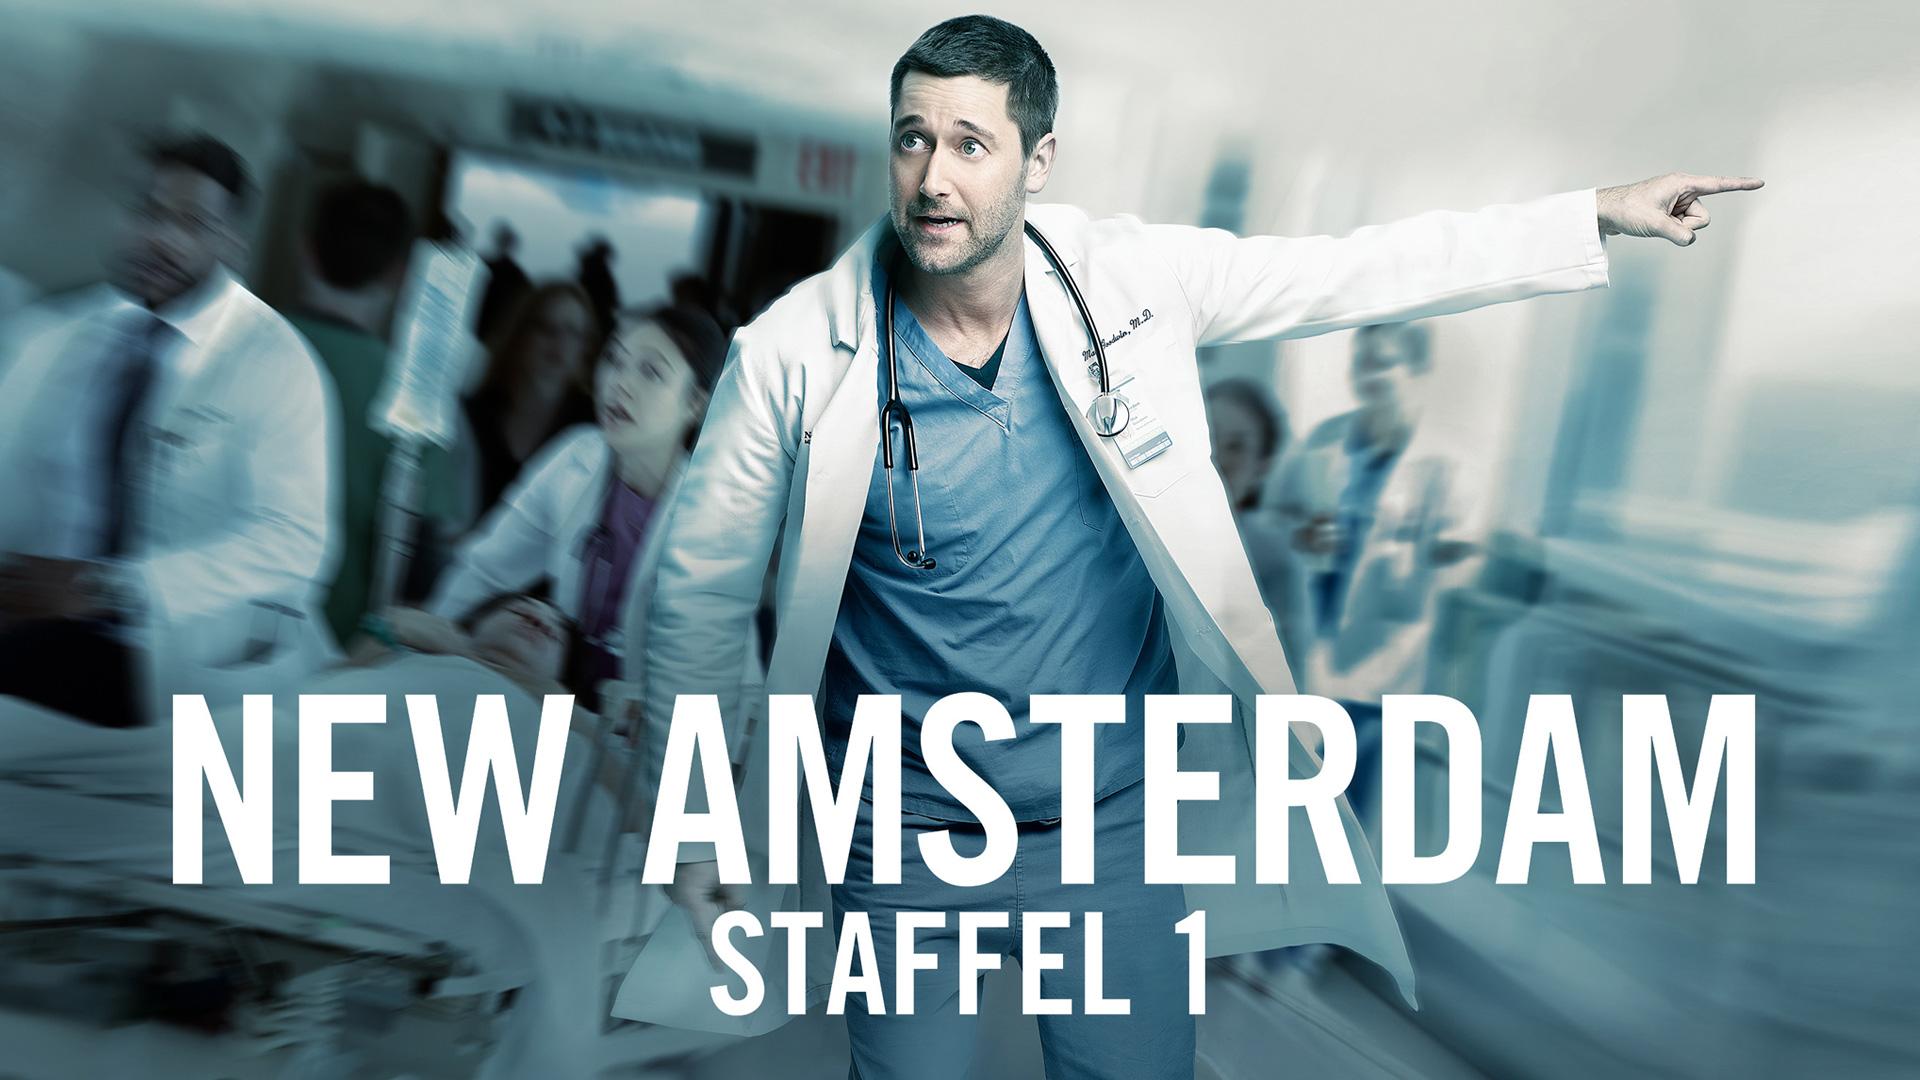 New Amsterdam - Staffel 1 [dt./OV]